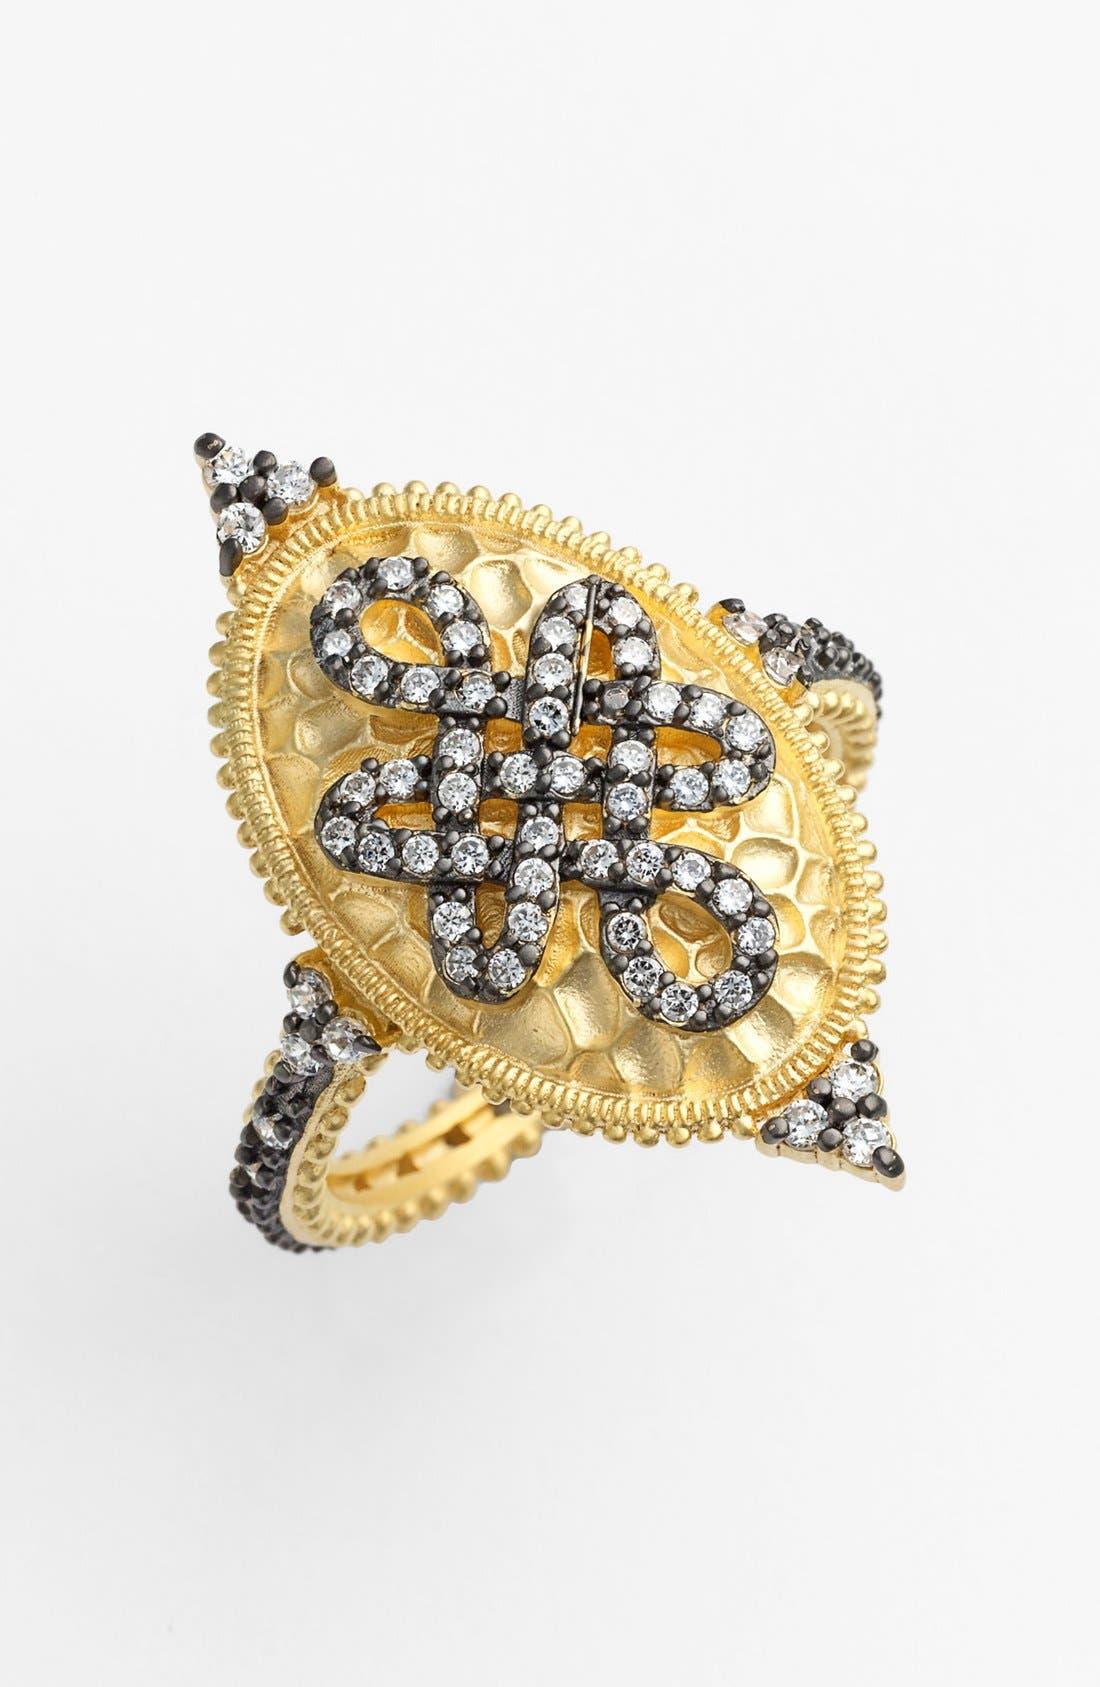 Main Image - FREIDA ROTHMAN 'Gramercy' Love Knot Oval Shield Ring